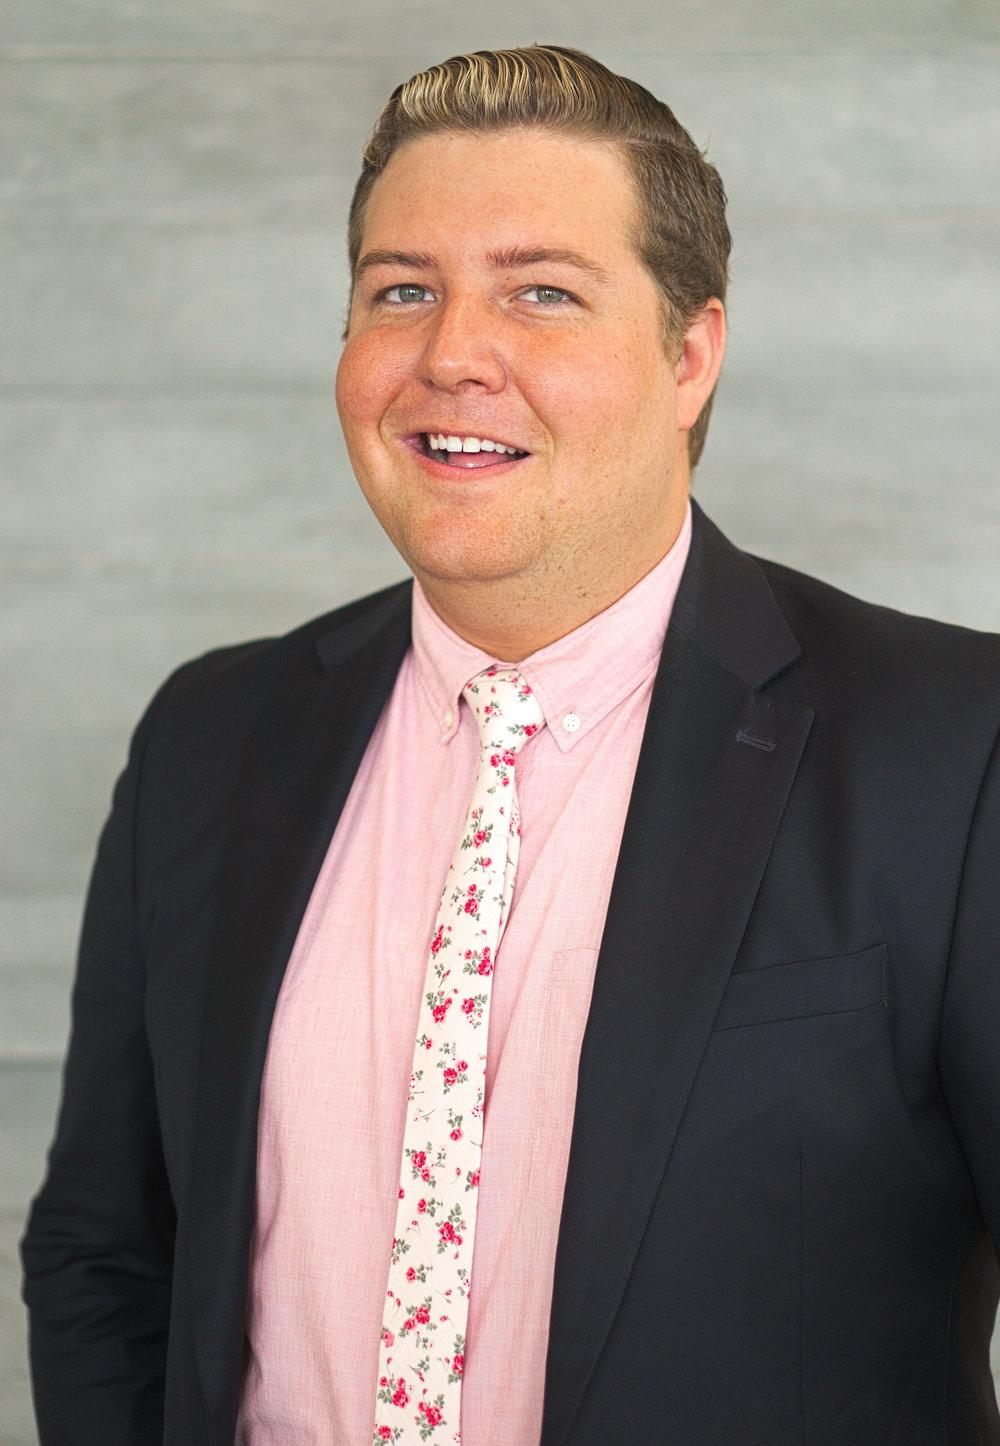 Wade Draper - VP of Advocacy